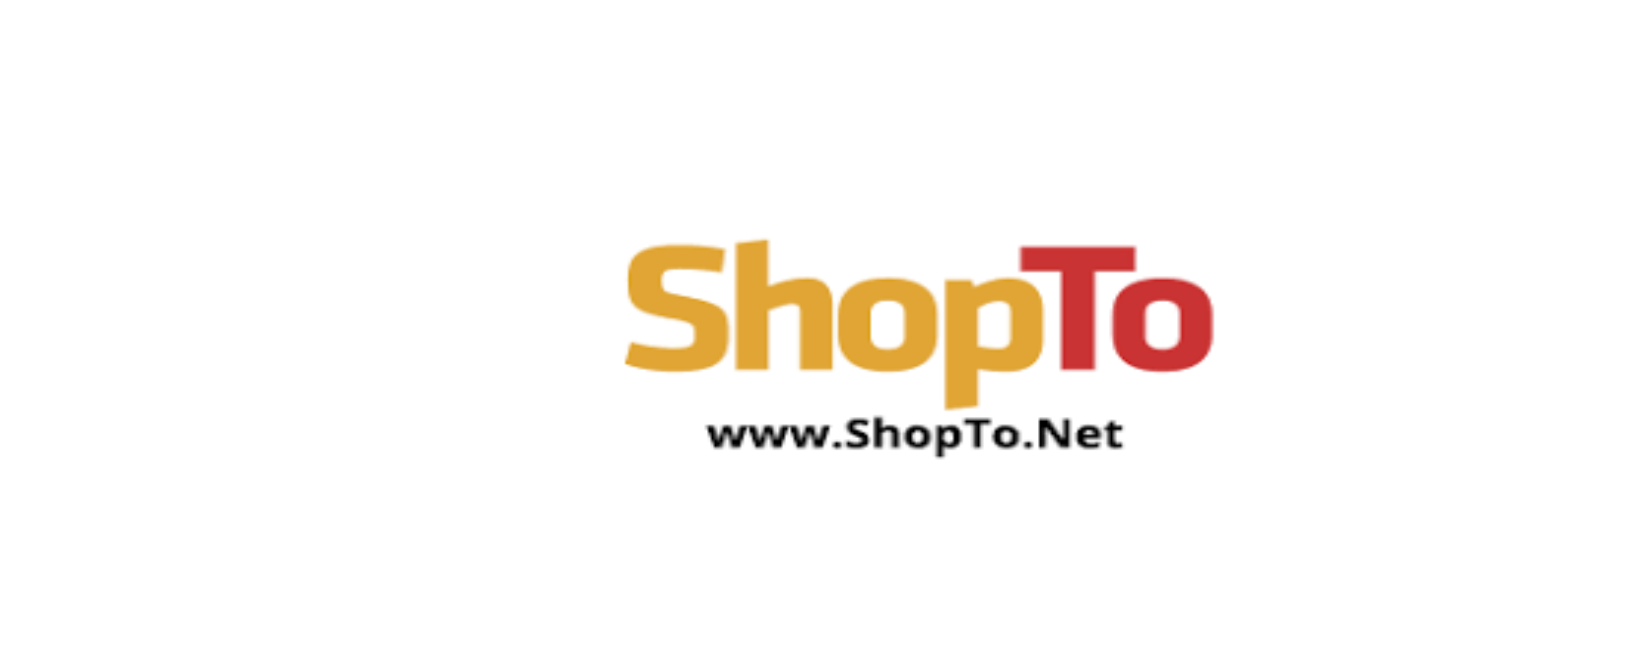 ShopTo UK Discount Code 2021